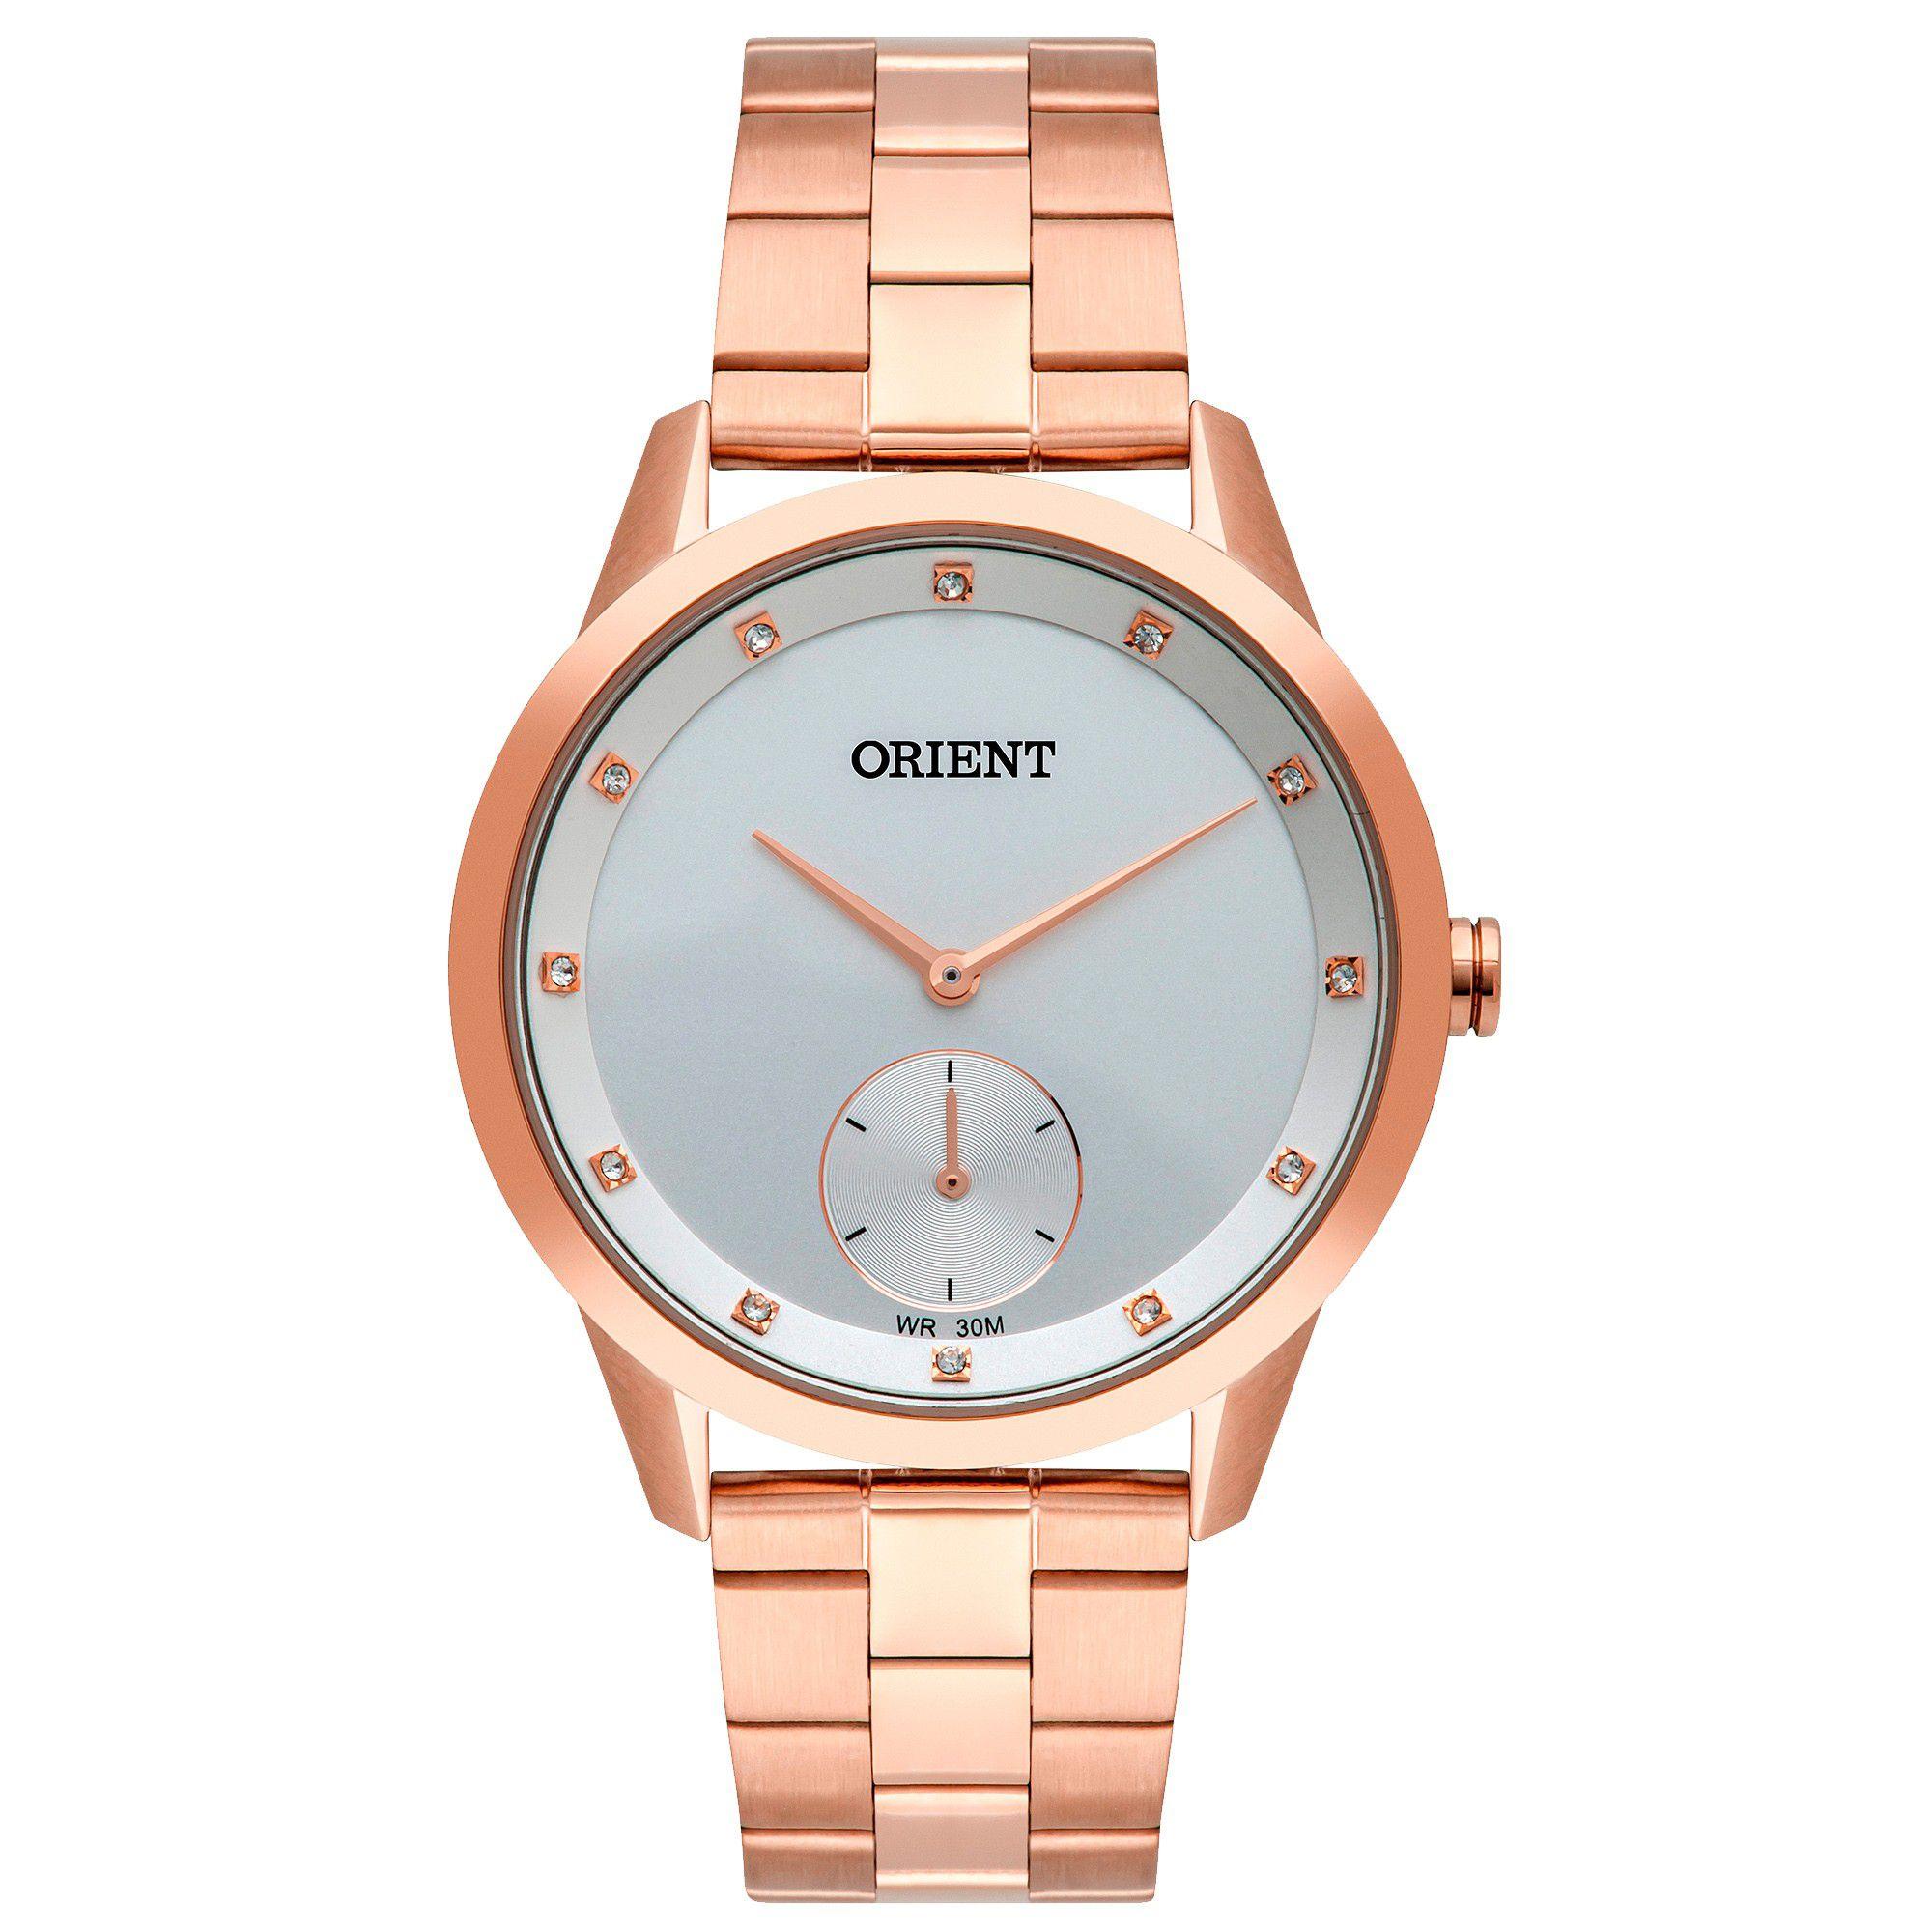 Relógio Feminino Orient FRSS0065 S1RX